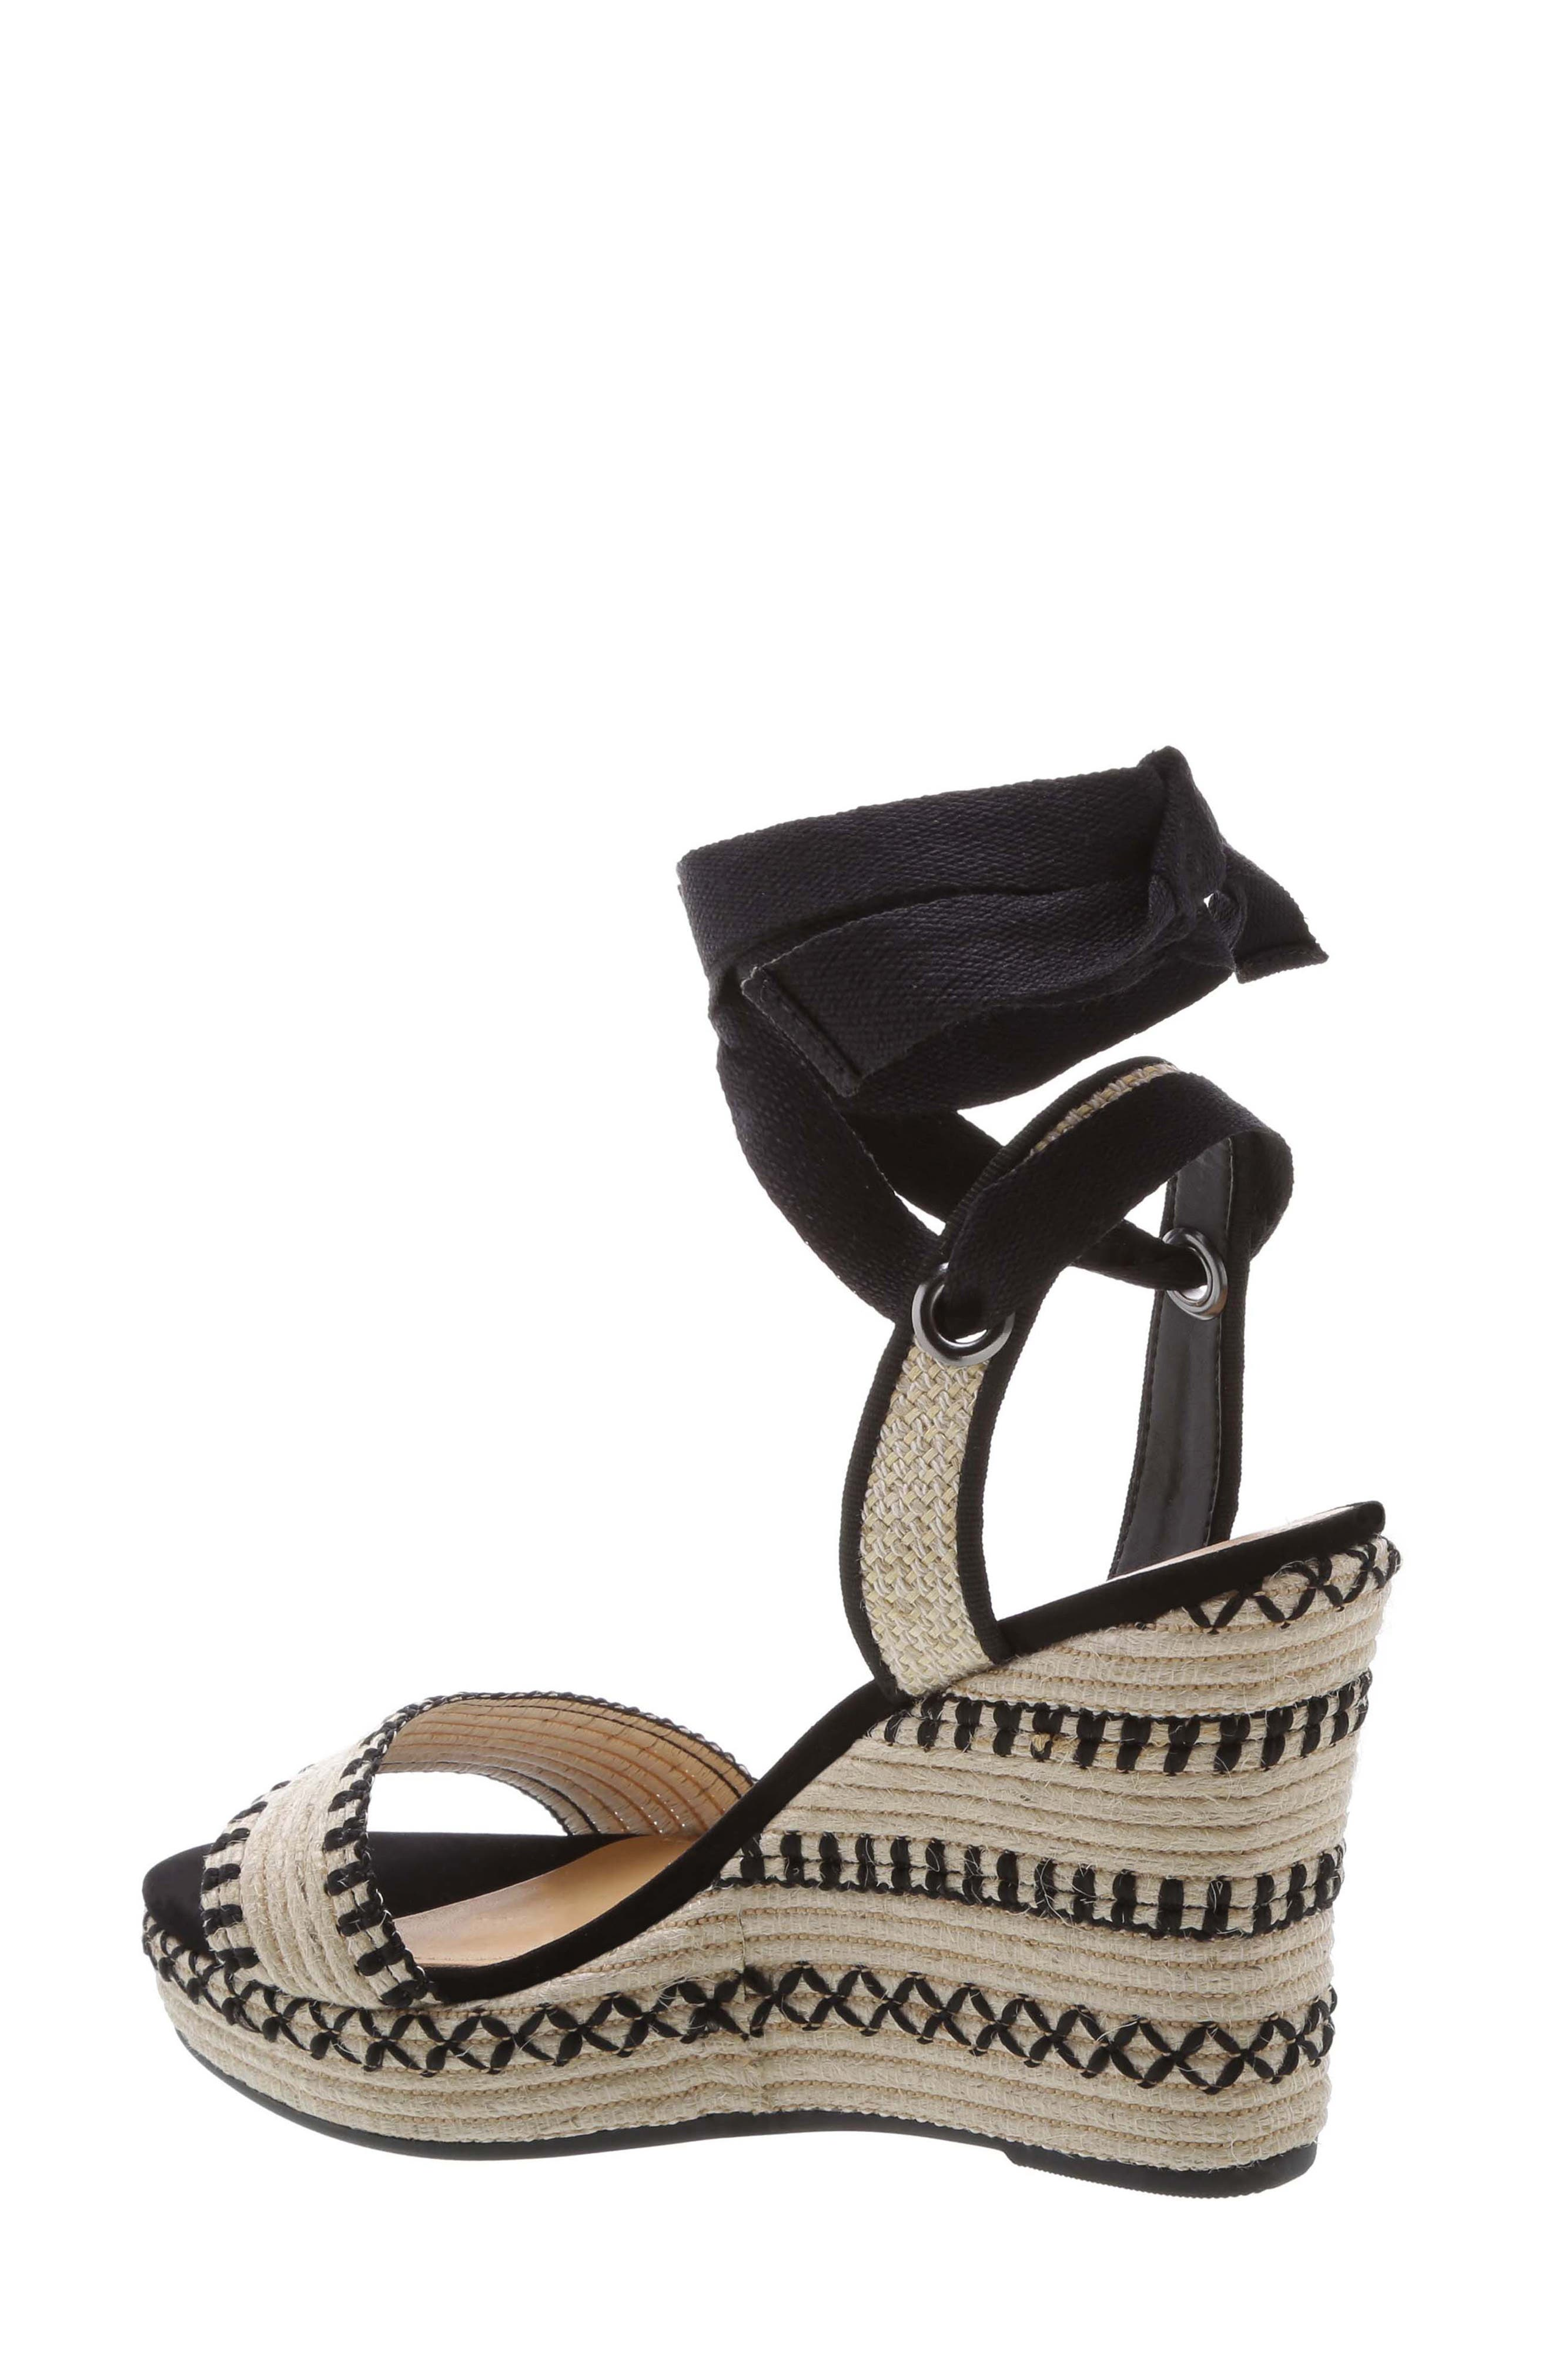 Electra Platform Wedge Sandal,                             Alternate thumbnail 2, color,                             NATURAL BLACK FABRIC